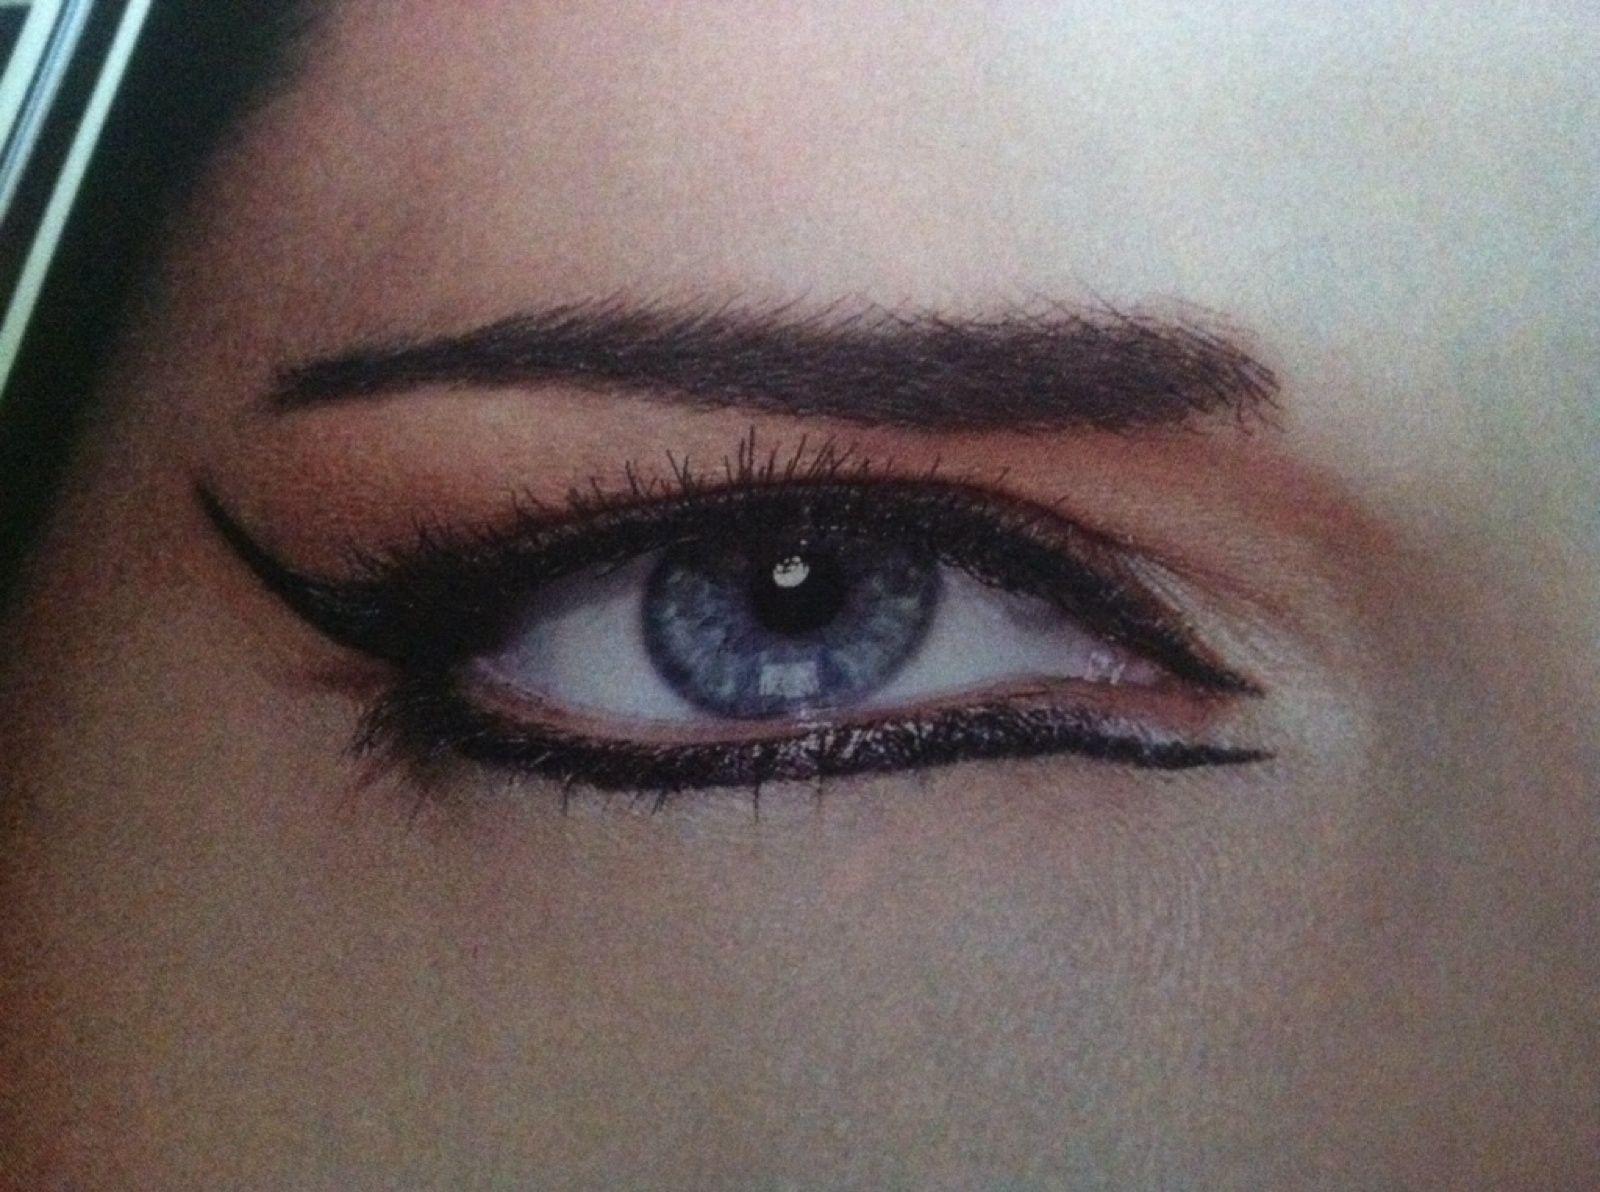 Pin on Eyes shsdows